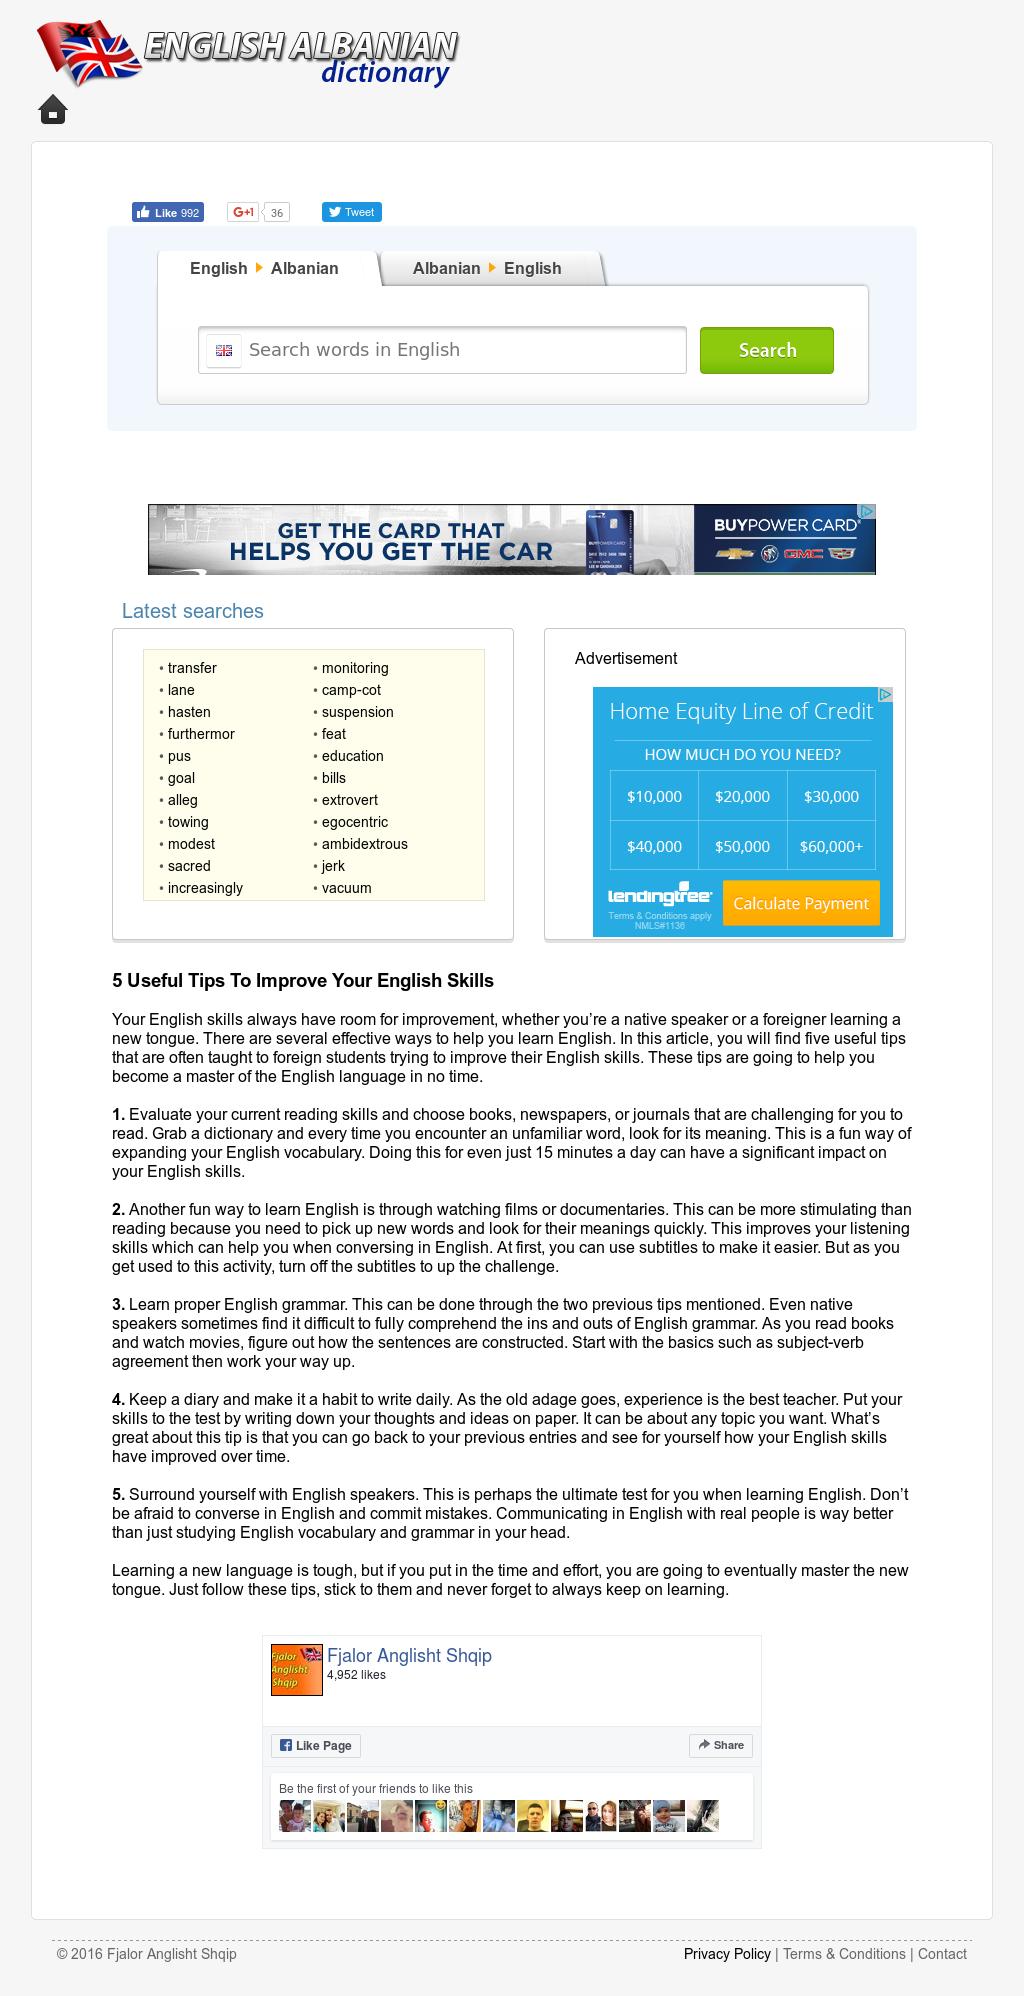 Fjalor Anglisht Shqip Competitors, Revenue and Employees